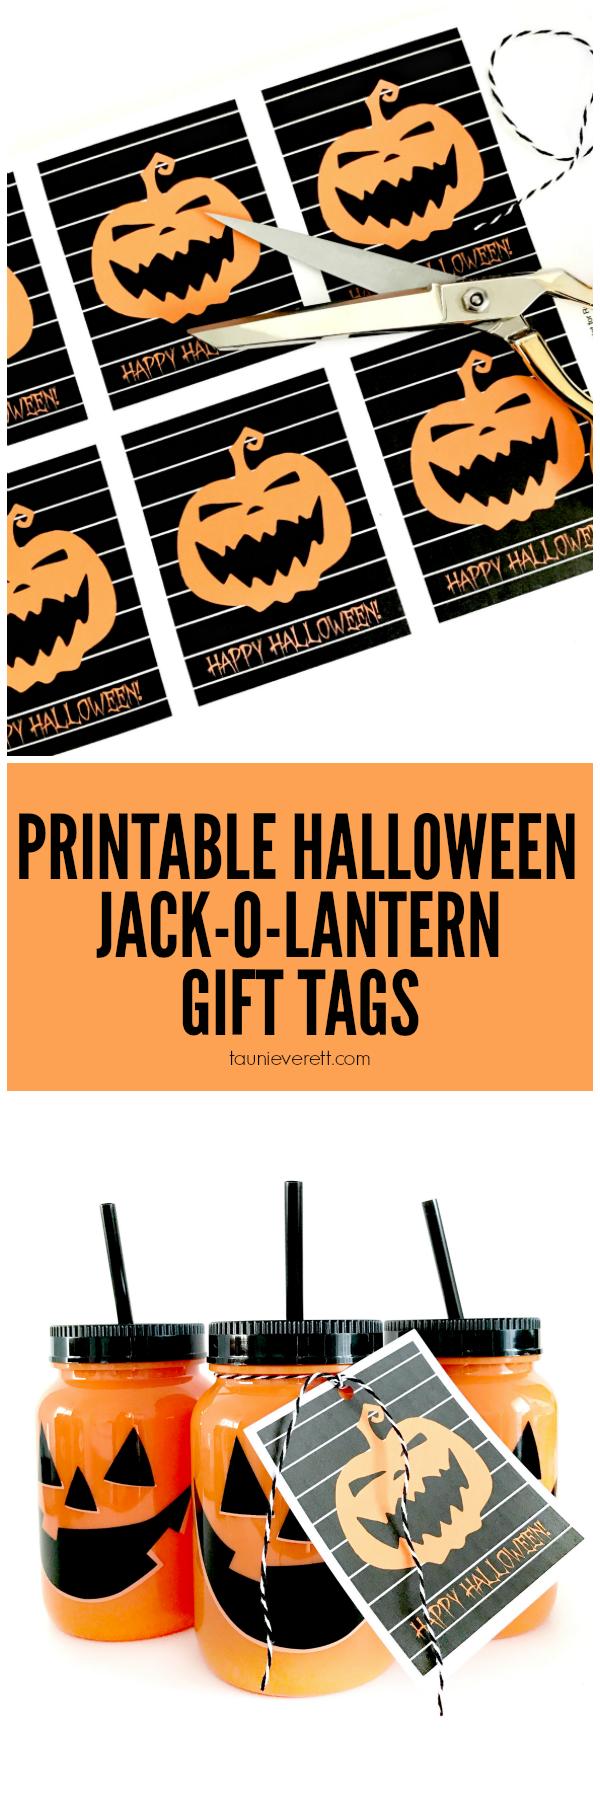 image relating to Printable Halloween Tag named Jack-O-Lantern Halloween Printable Reward Tag - 1825